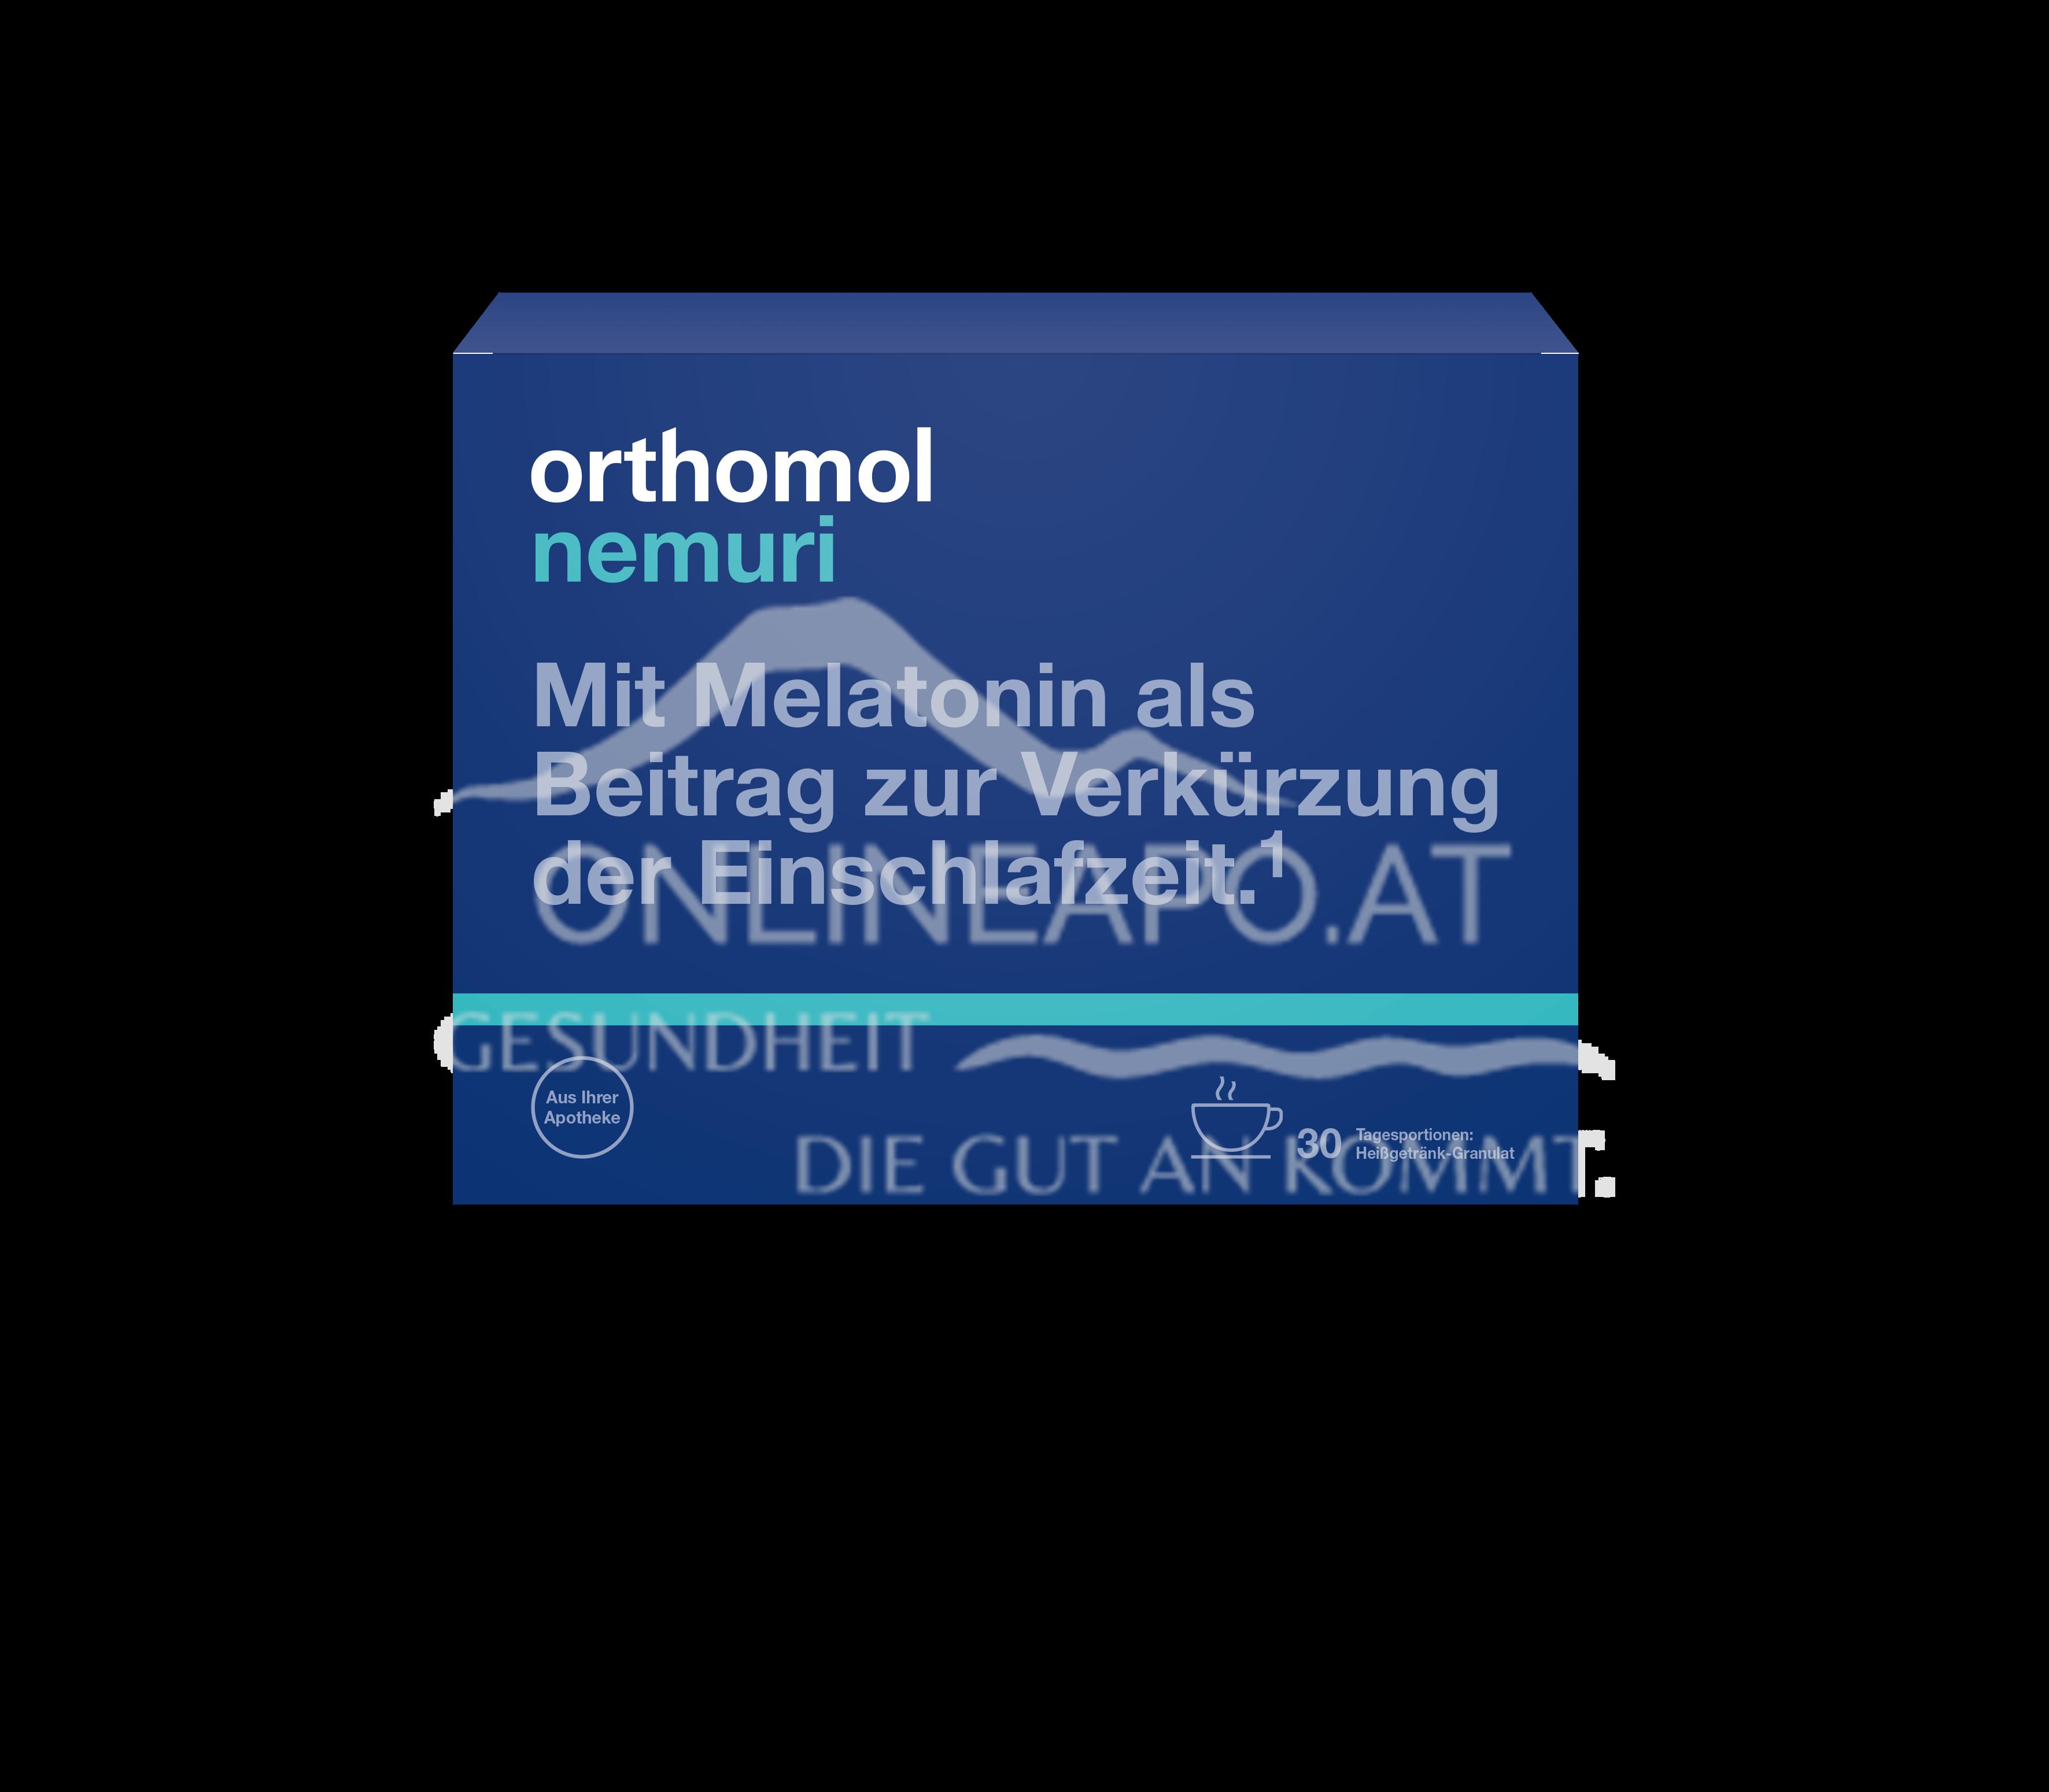 Orthomol Nemuri night Heißgetränk-Granulat